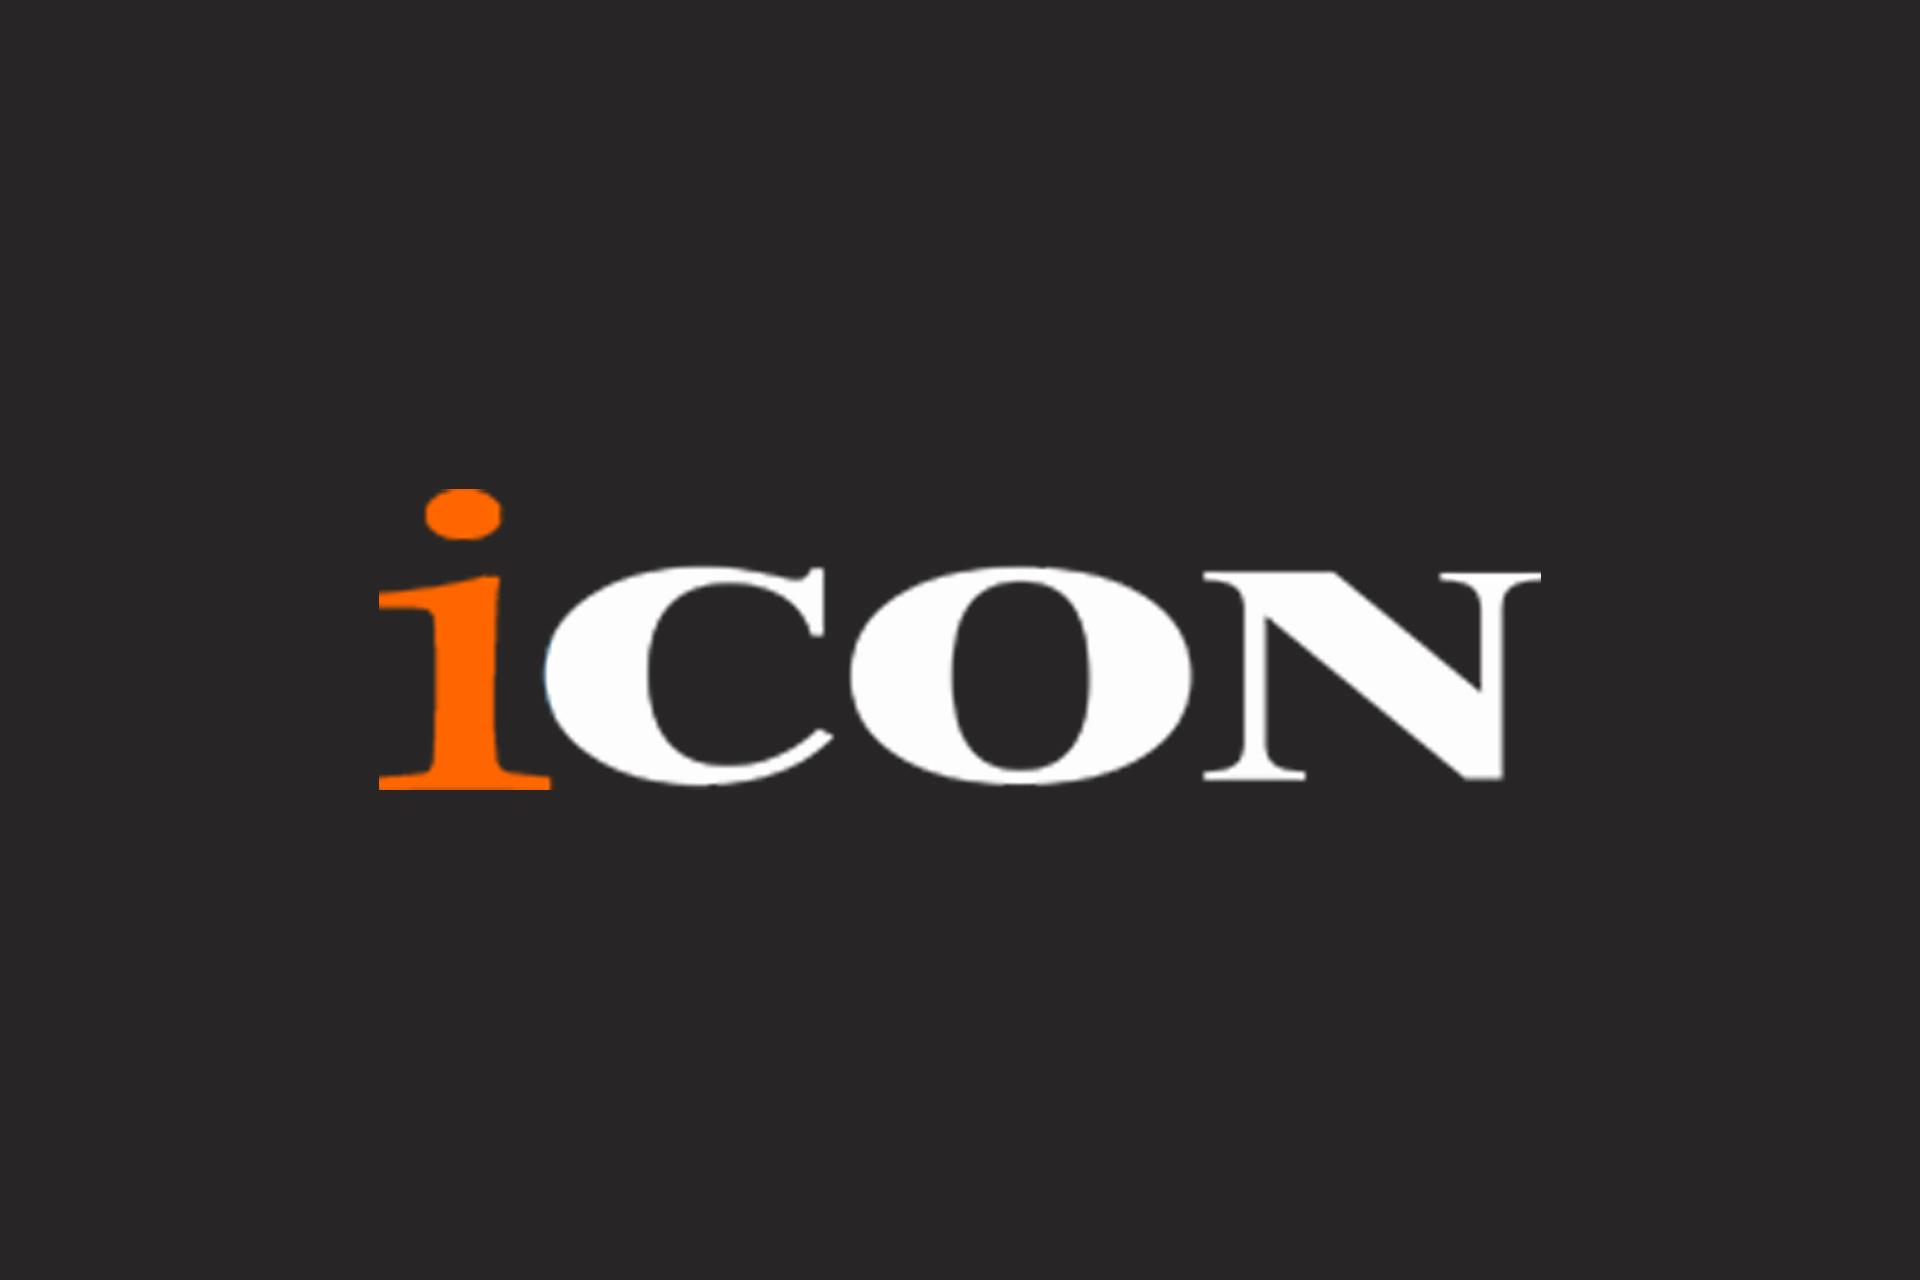 ICON Digital USA